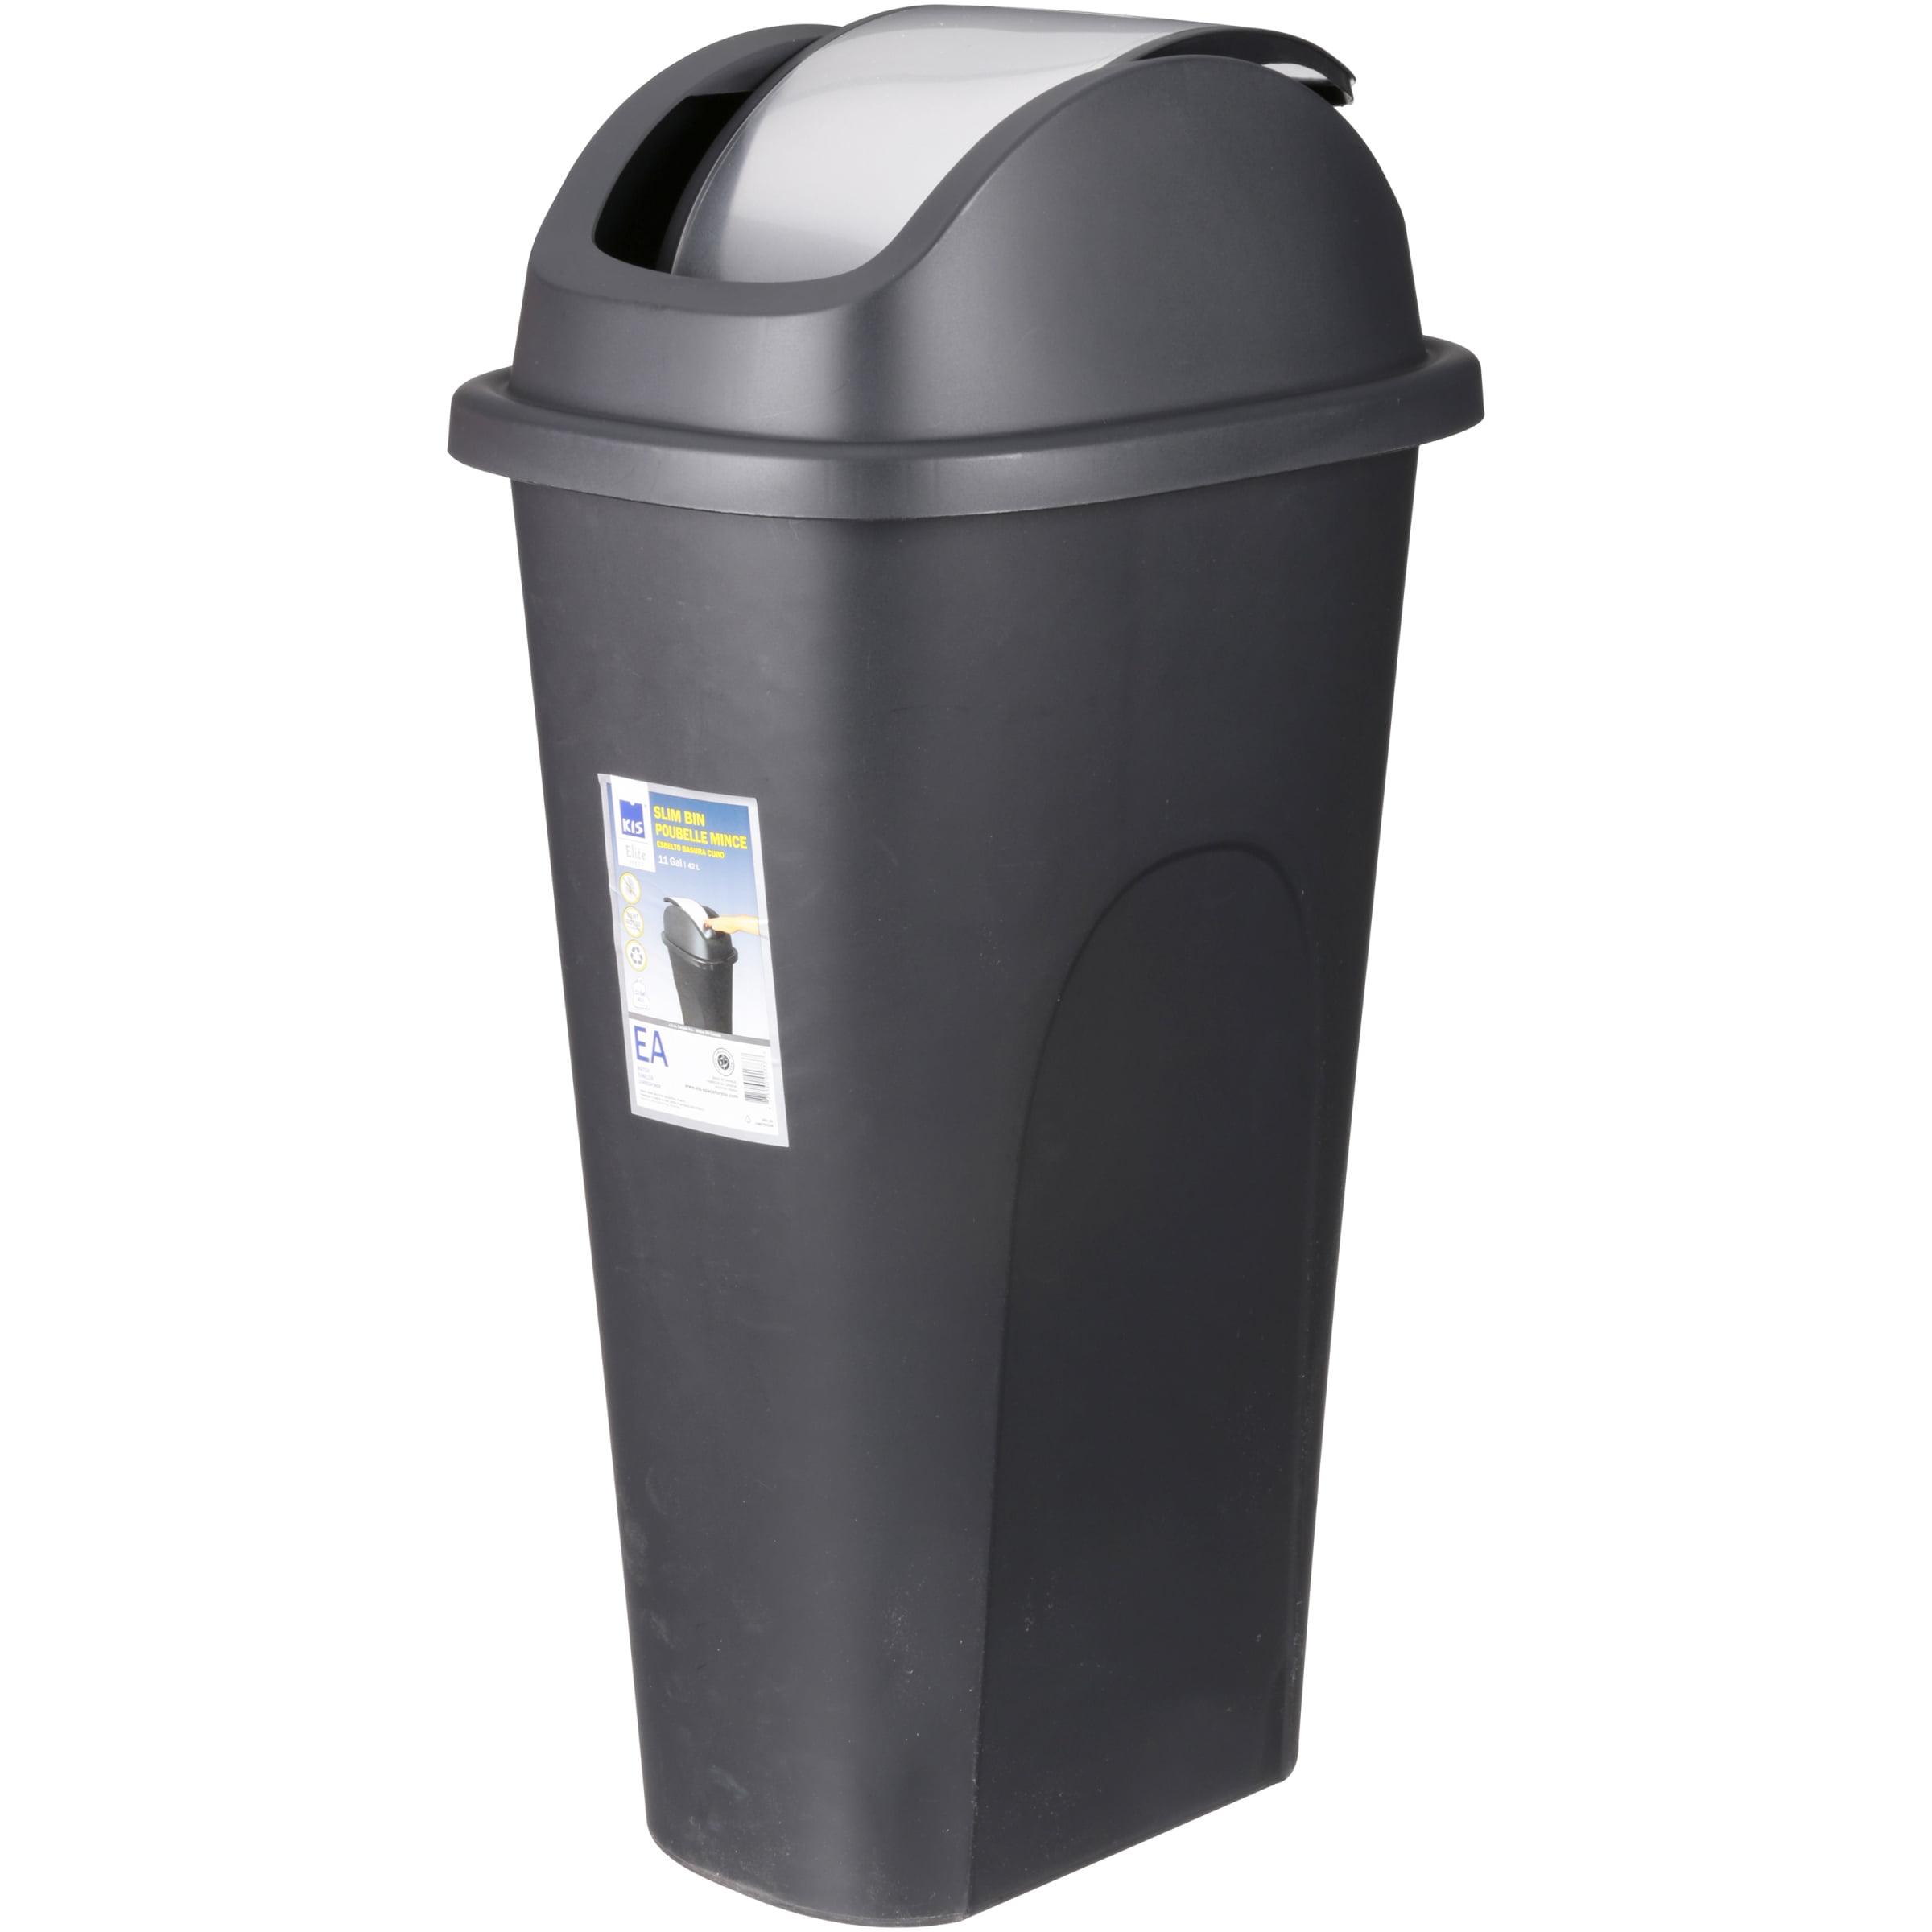 Beau Kitchen Wastebasket Trash Can Plastic Garbage Storage Bin W/Swing Lid Slim  11gal